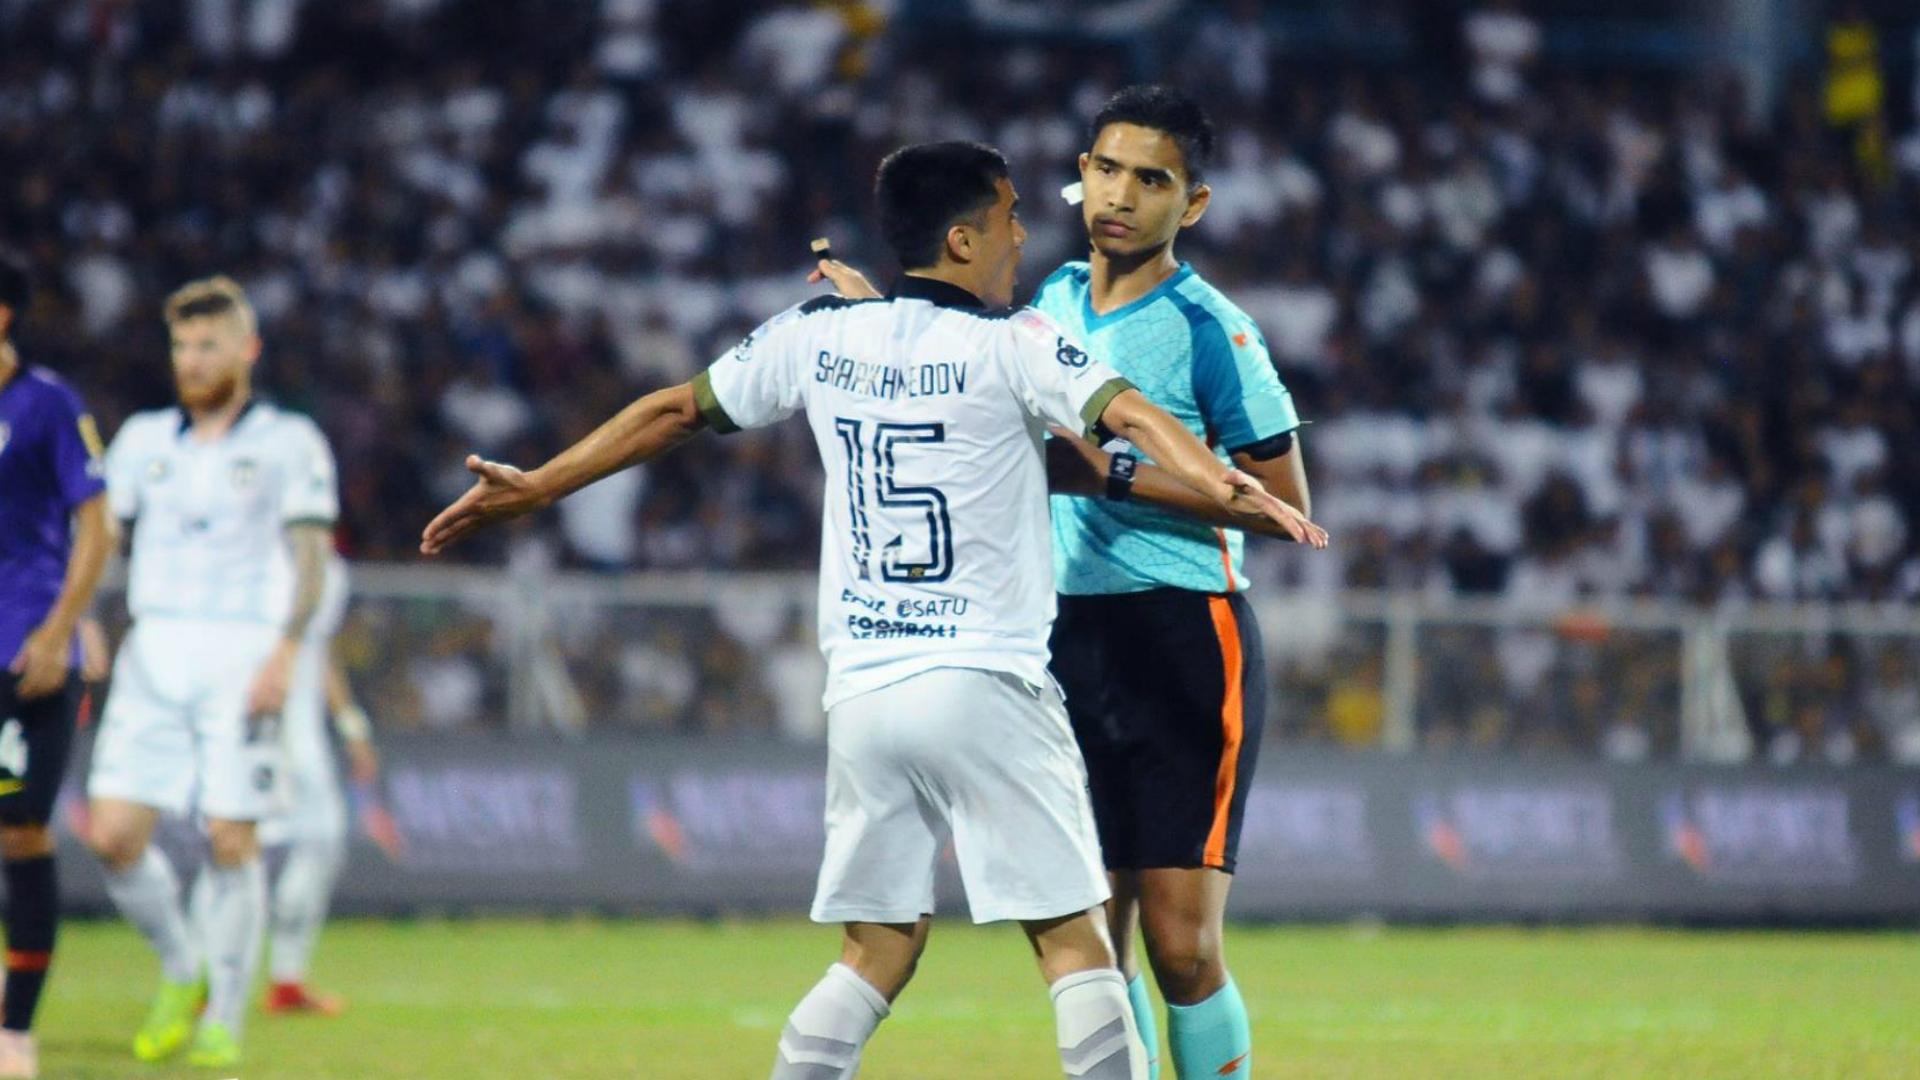 Irfan praises fighting spirit after salvaging late draw against JDT